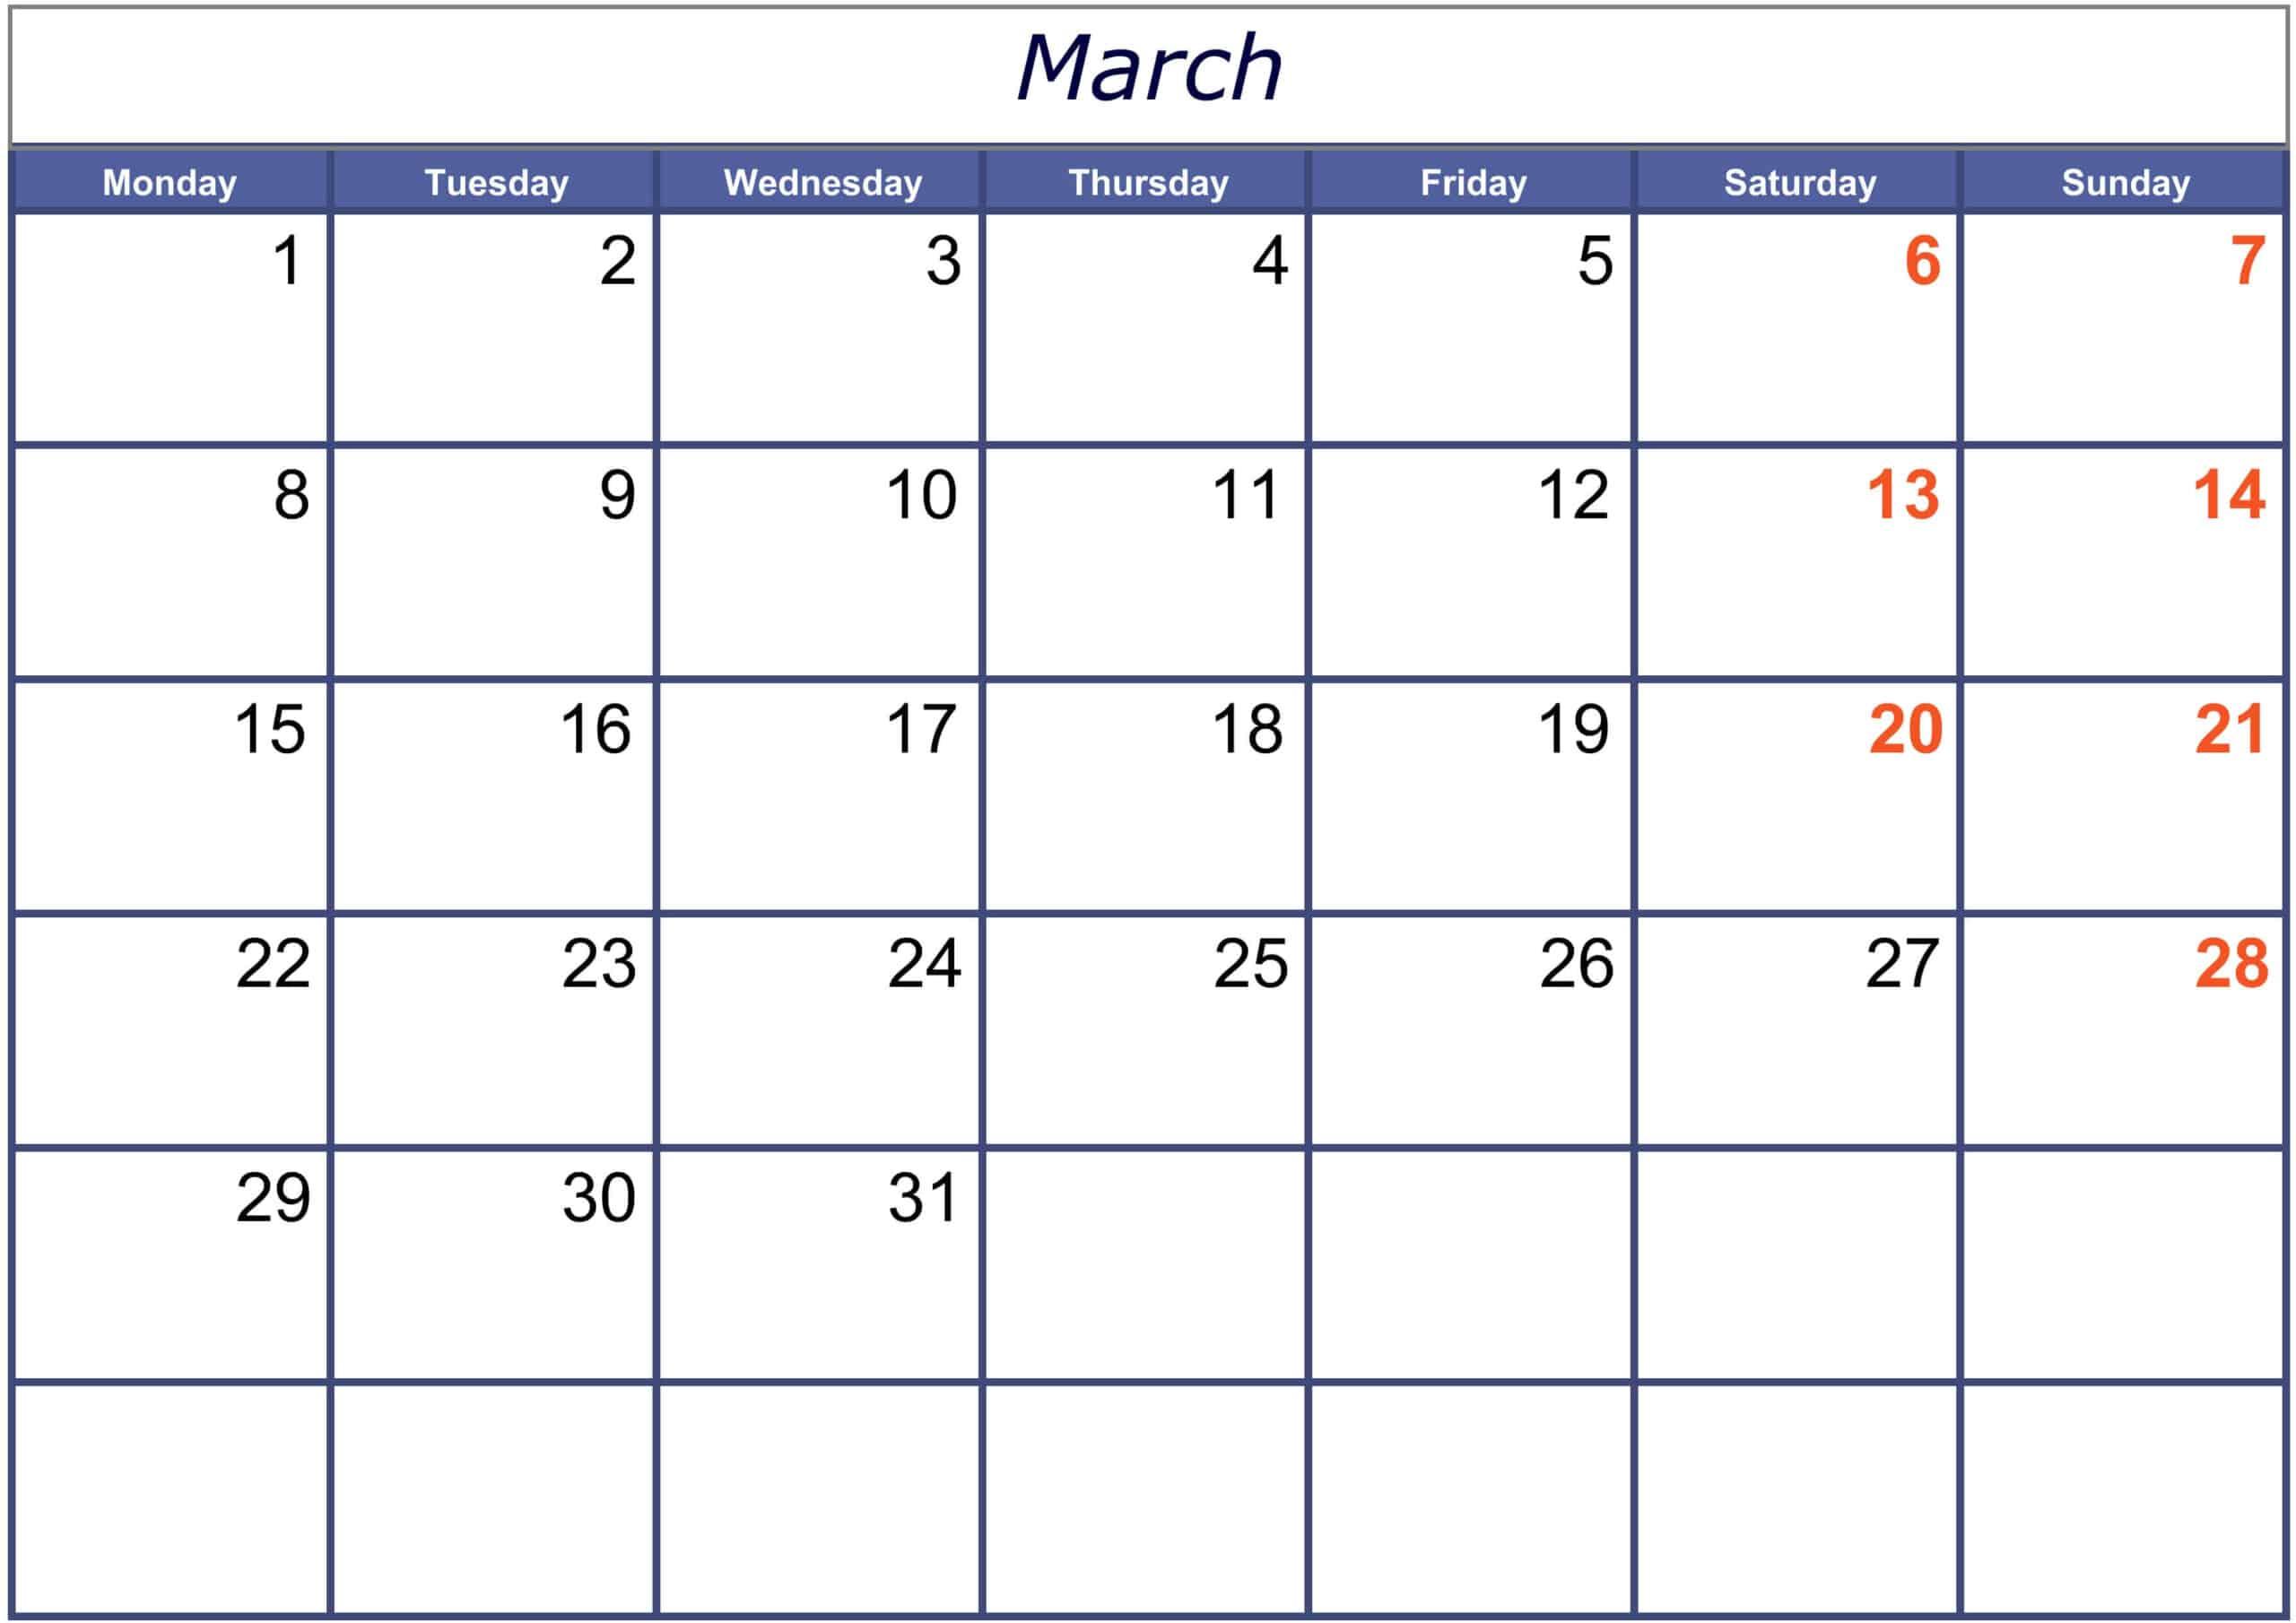 March 2021 Calendar With Holidays USA